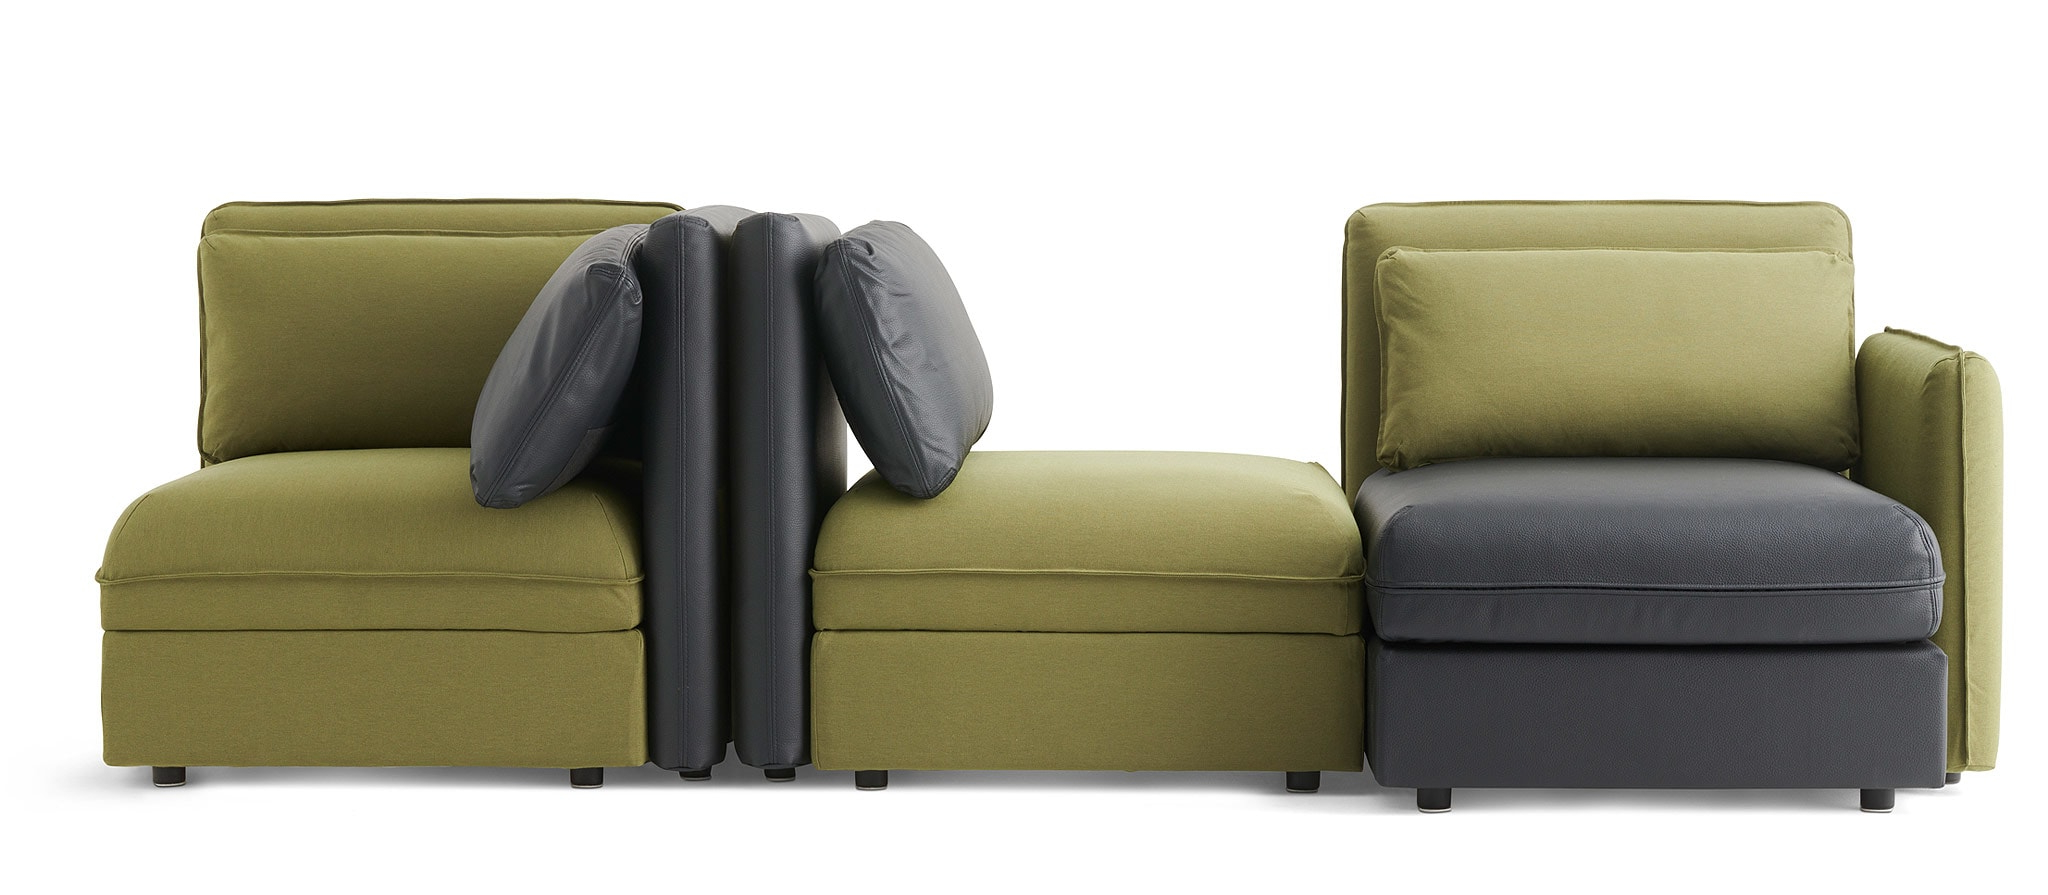 Sofa Modular Ikea Mndw Modular sofas Sectional sofas Ikea